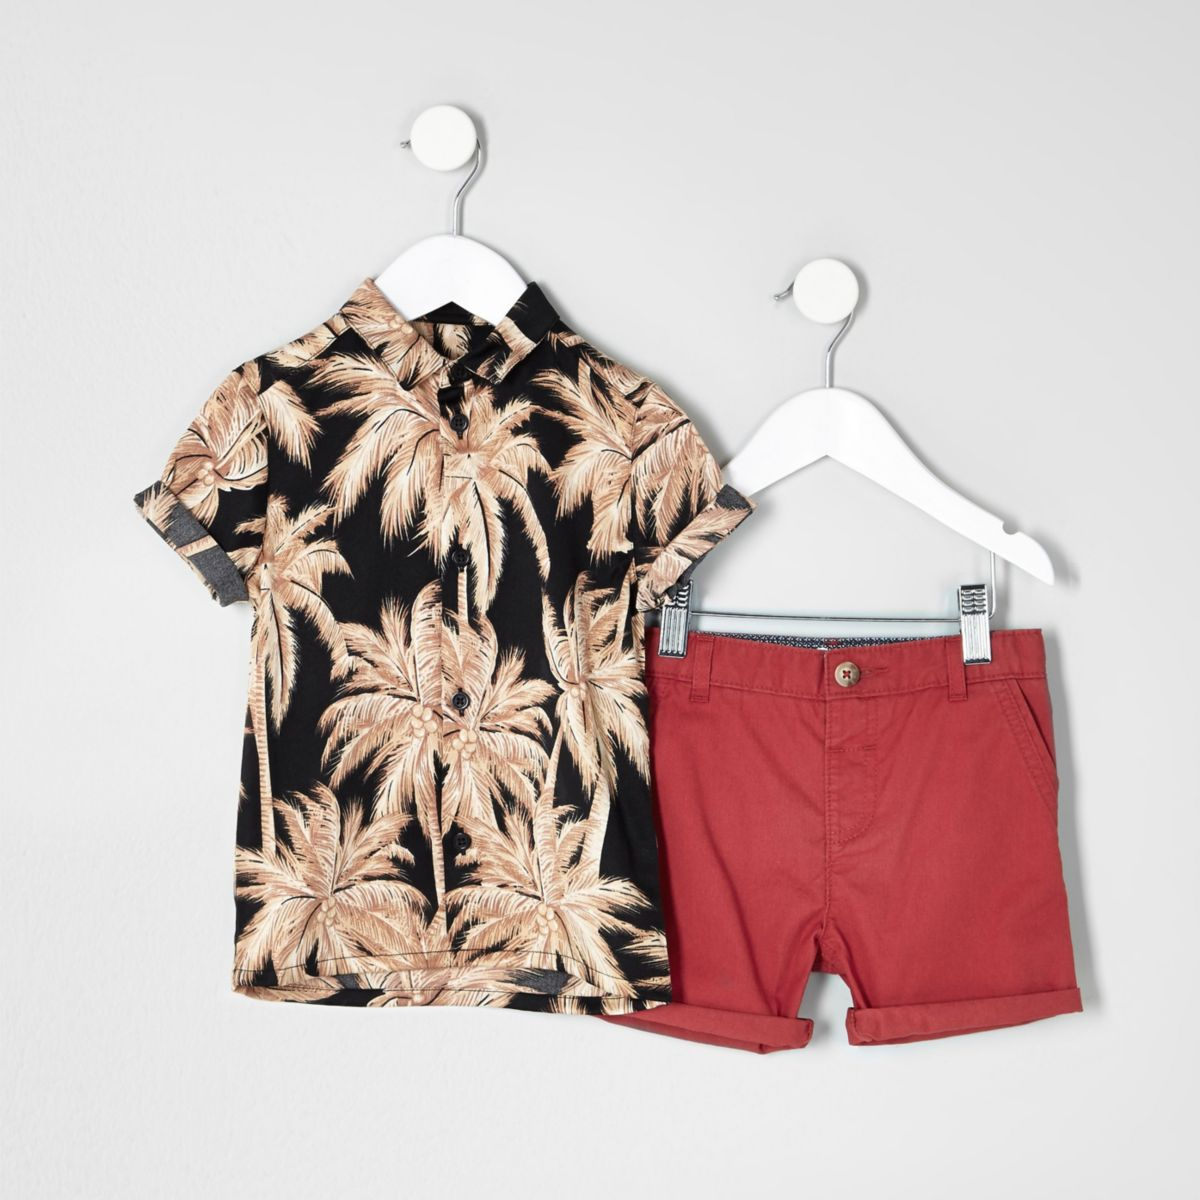 Mini boys Hawaiian shirt chino shorts outfit